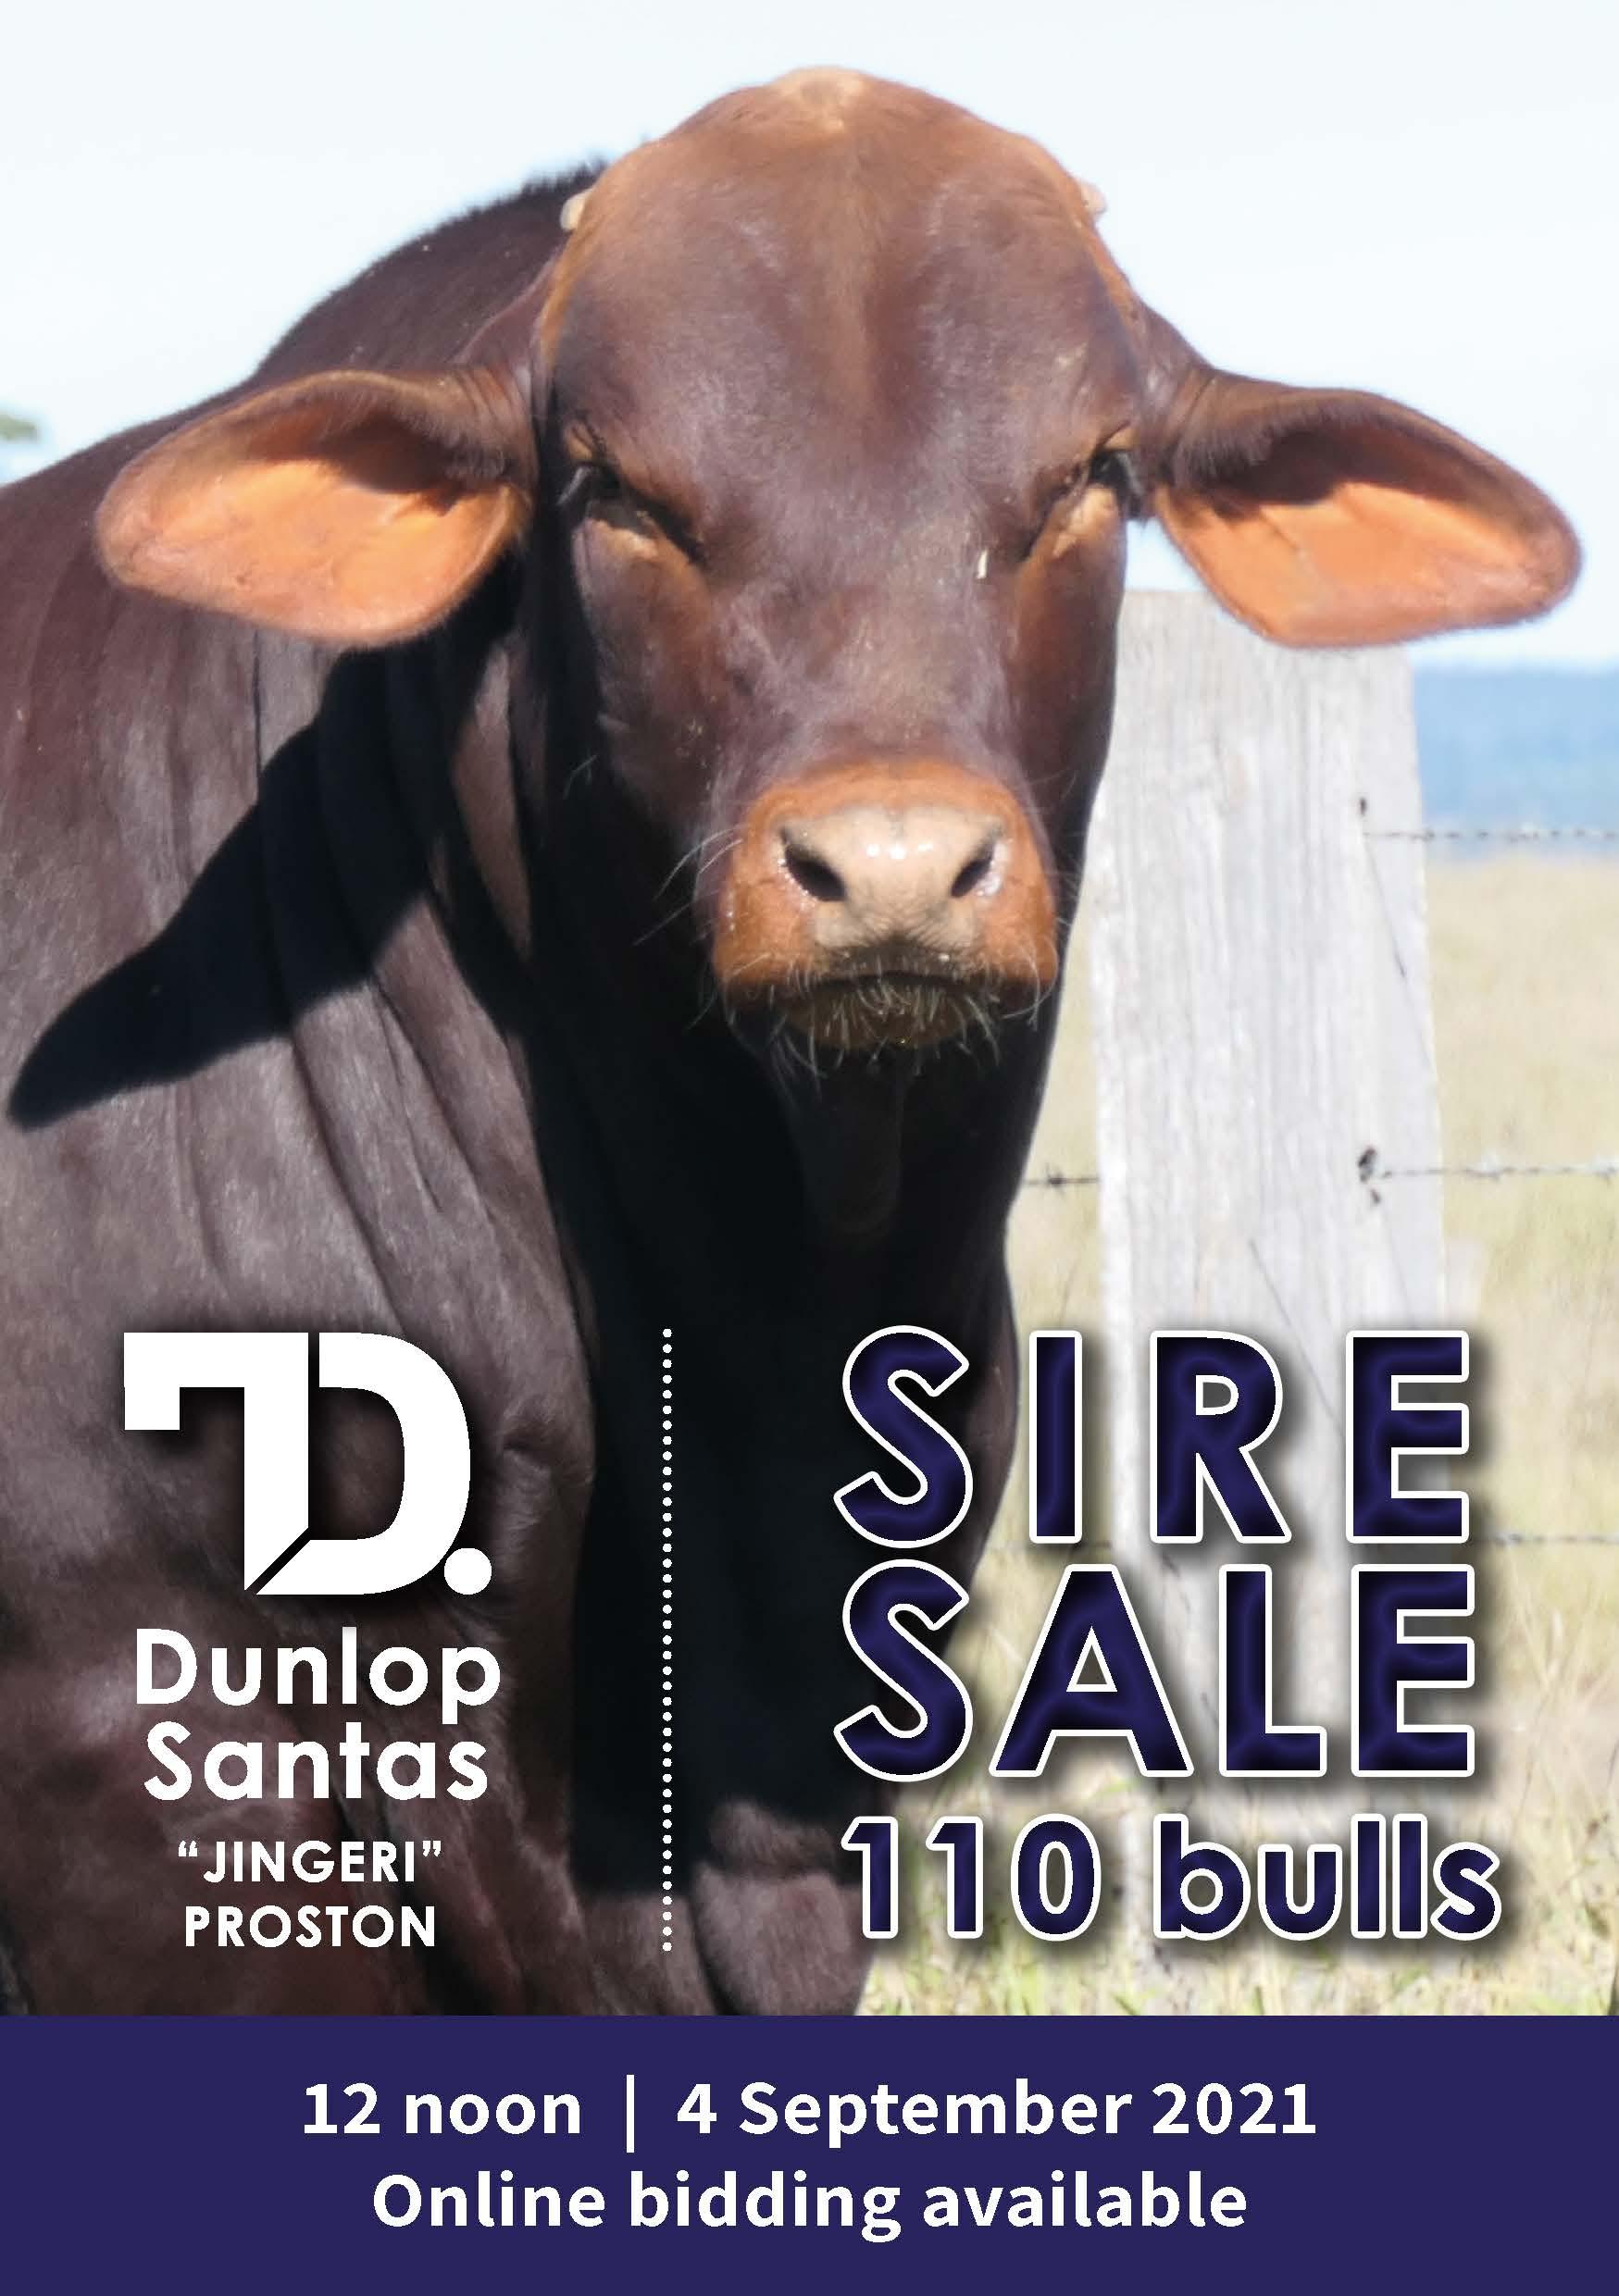 Dunlop Santas 2020 catalogue cover